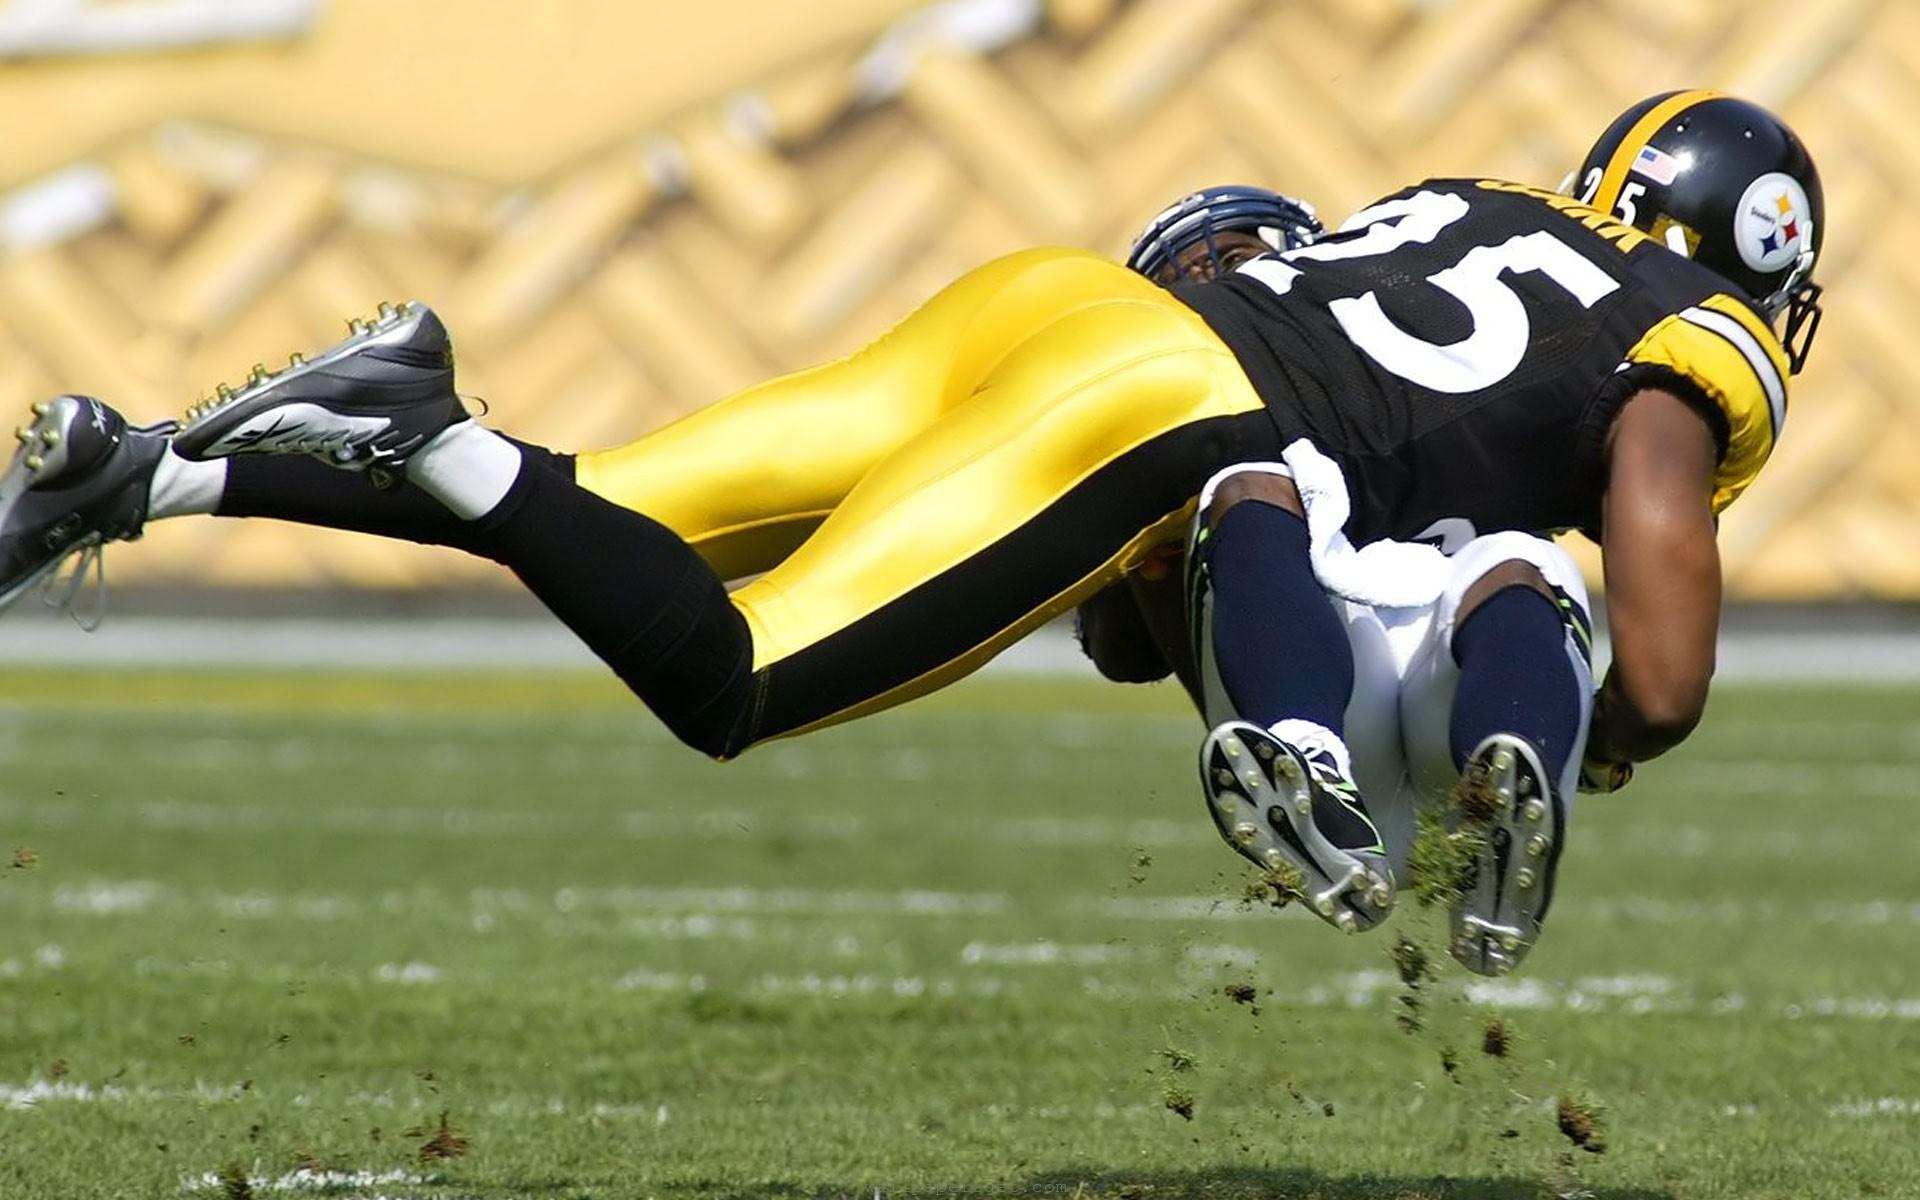 American Sports Material Wallpapers: Pittsburgh Steelers HD Wallpaper